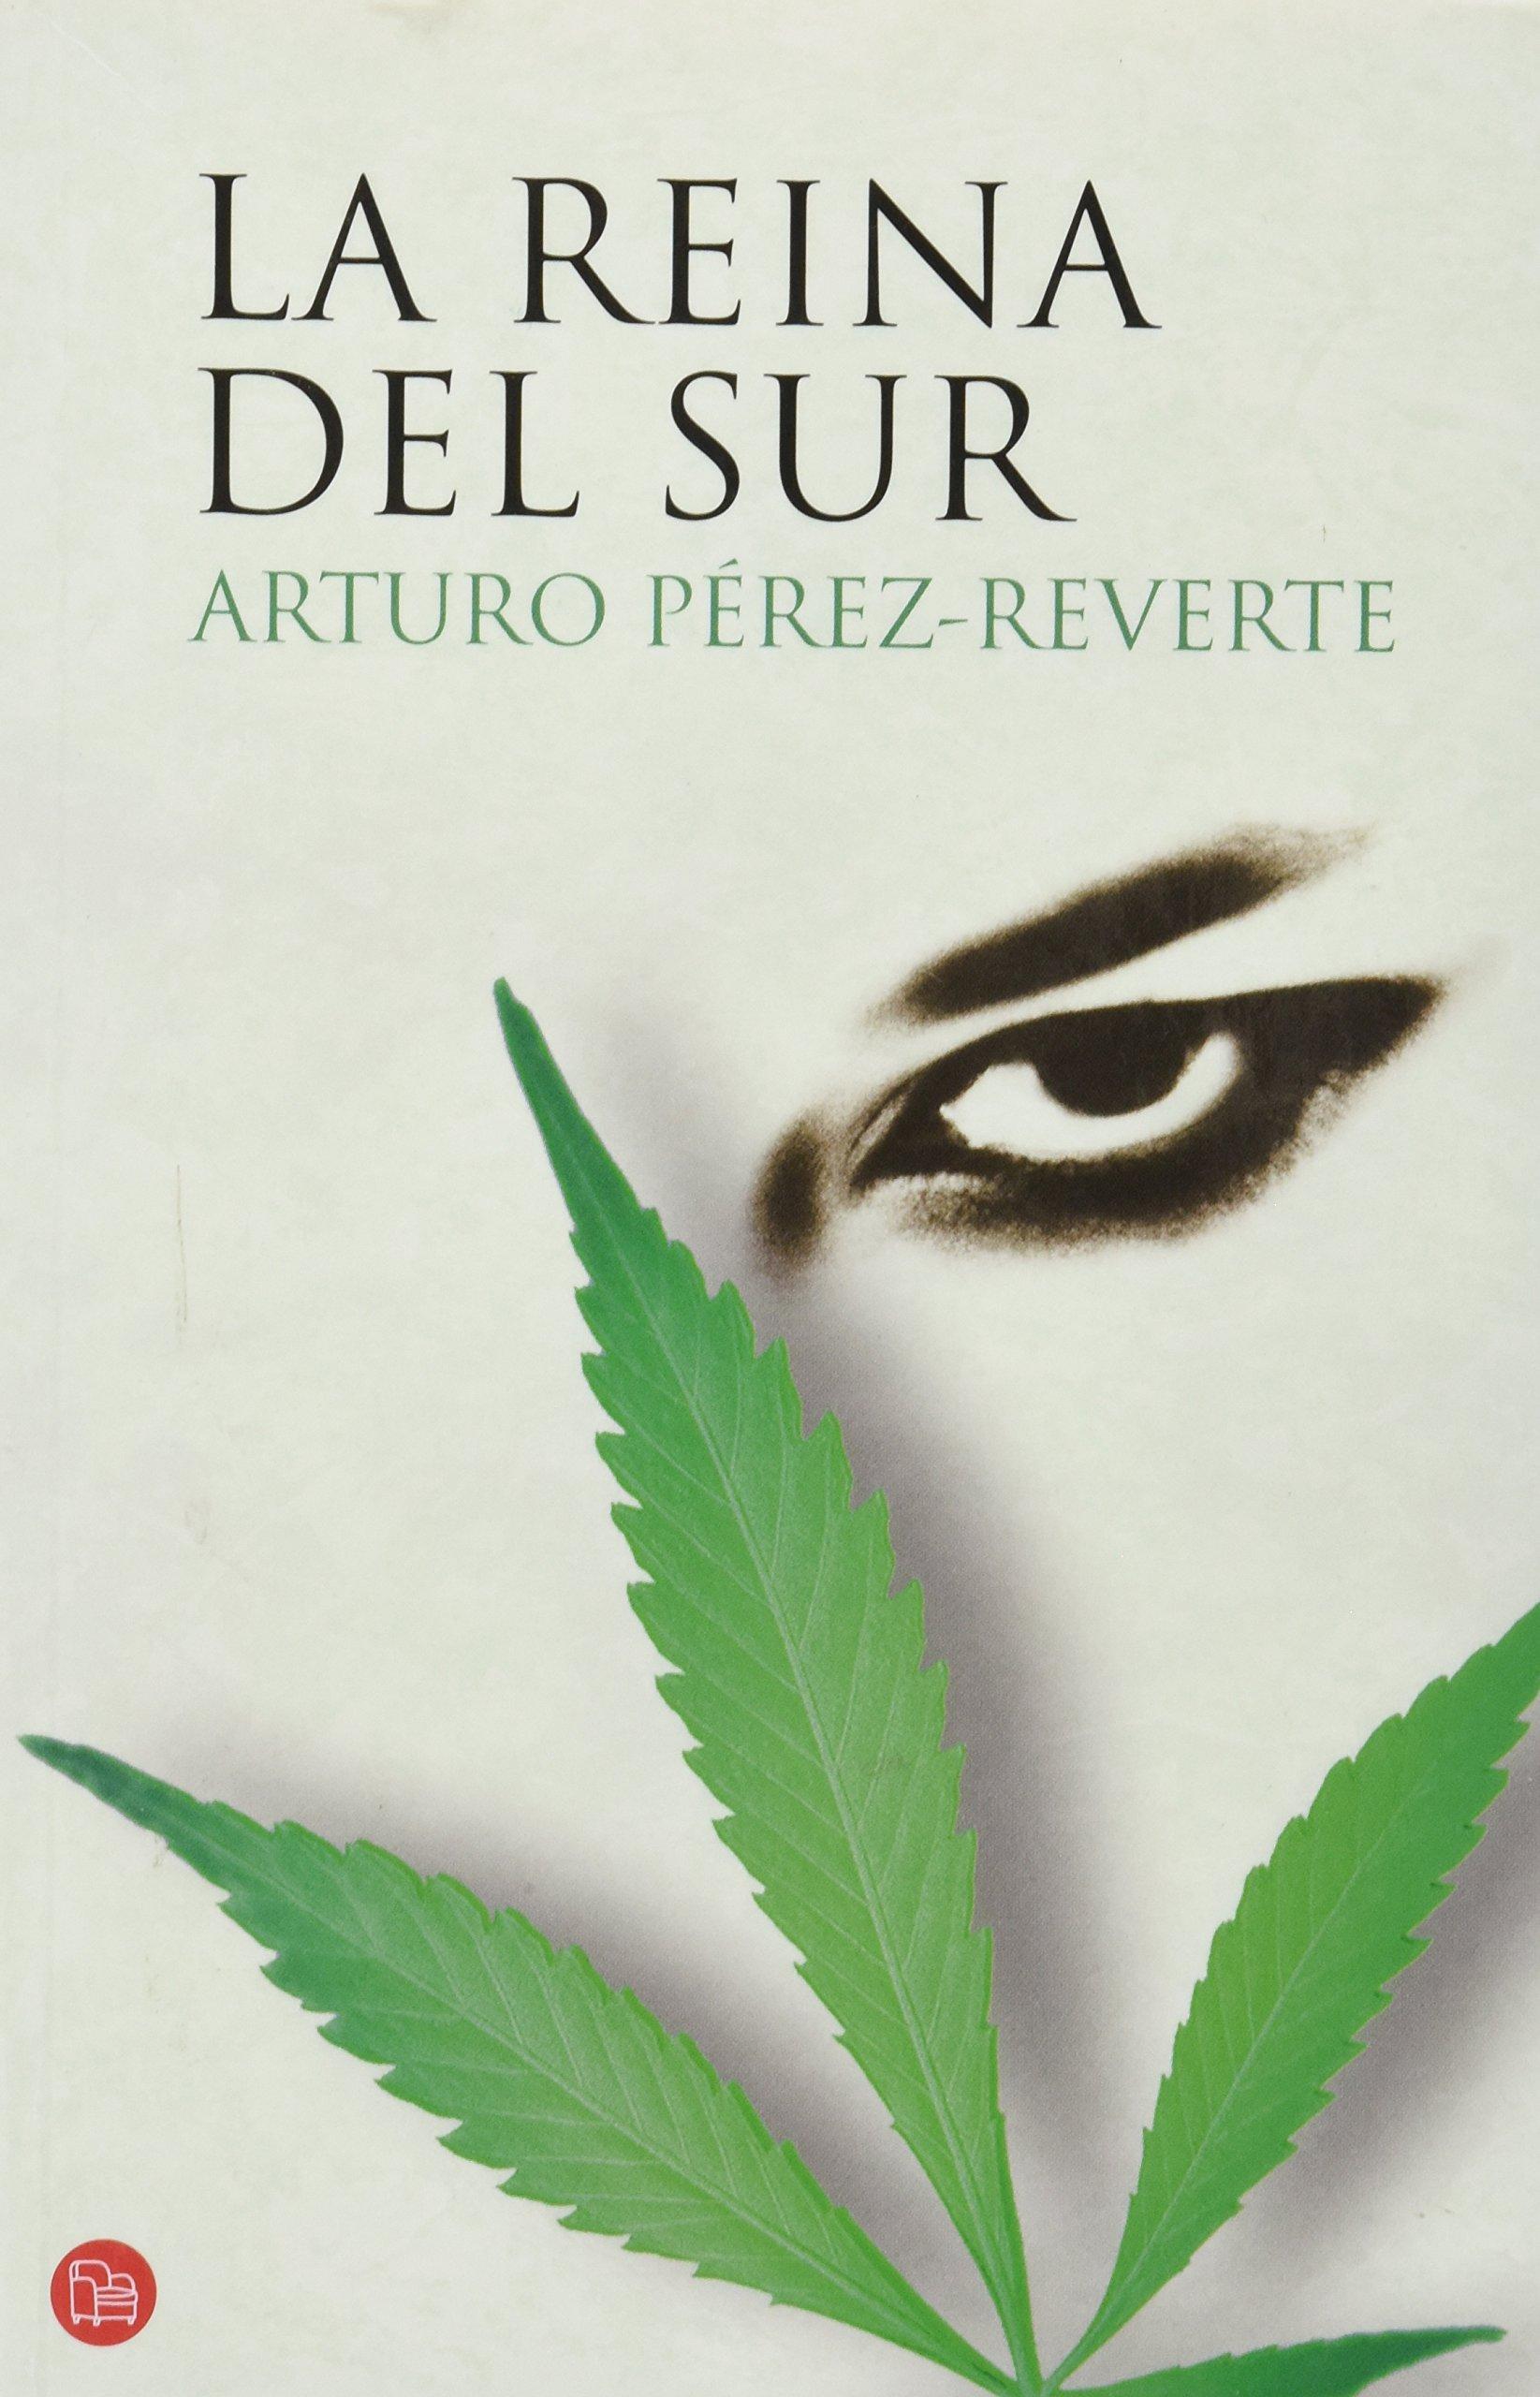 La reina del Sur / The Queen of the South (Spanish Edition) ebook